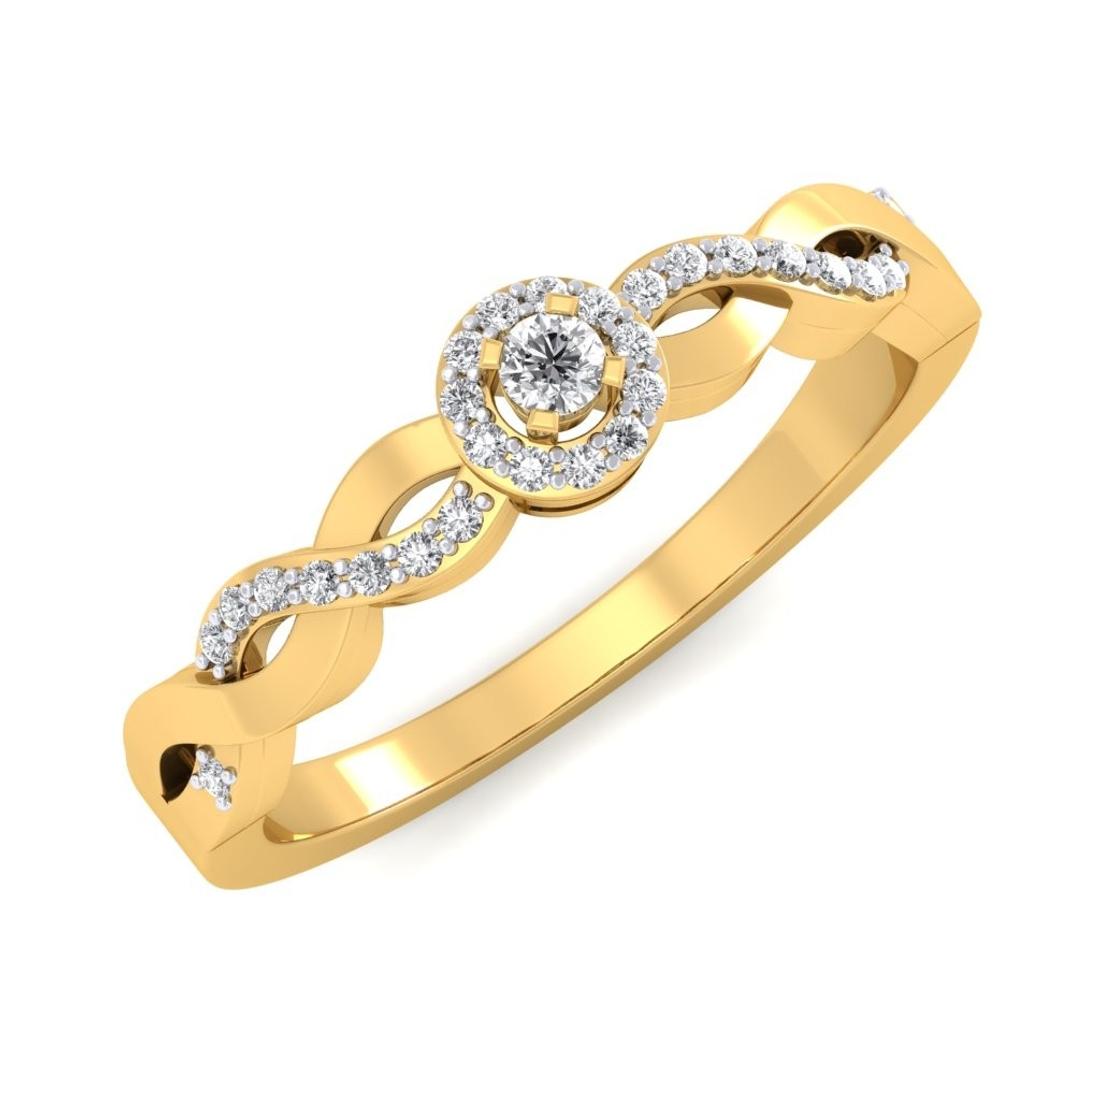 Sarvada Jewels' The Wave Diamond Ring